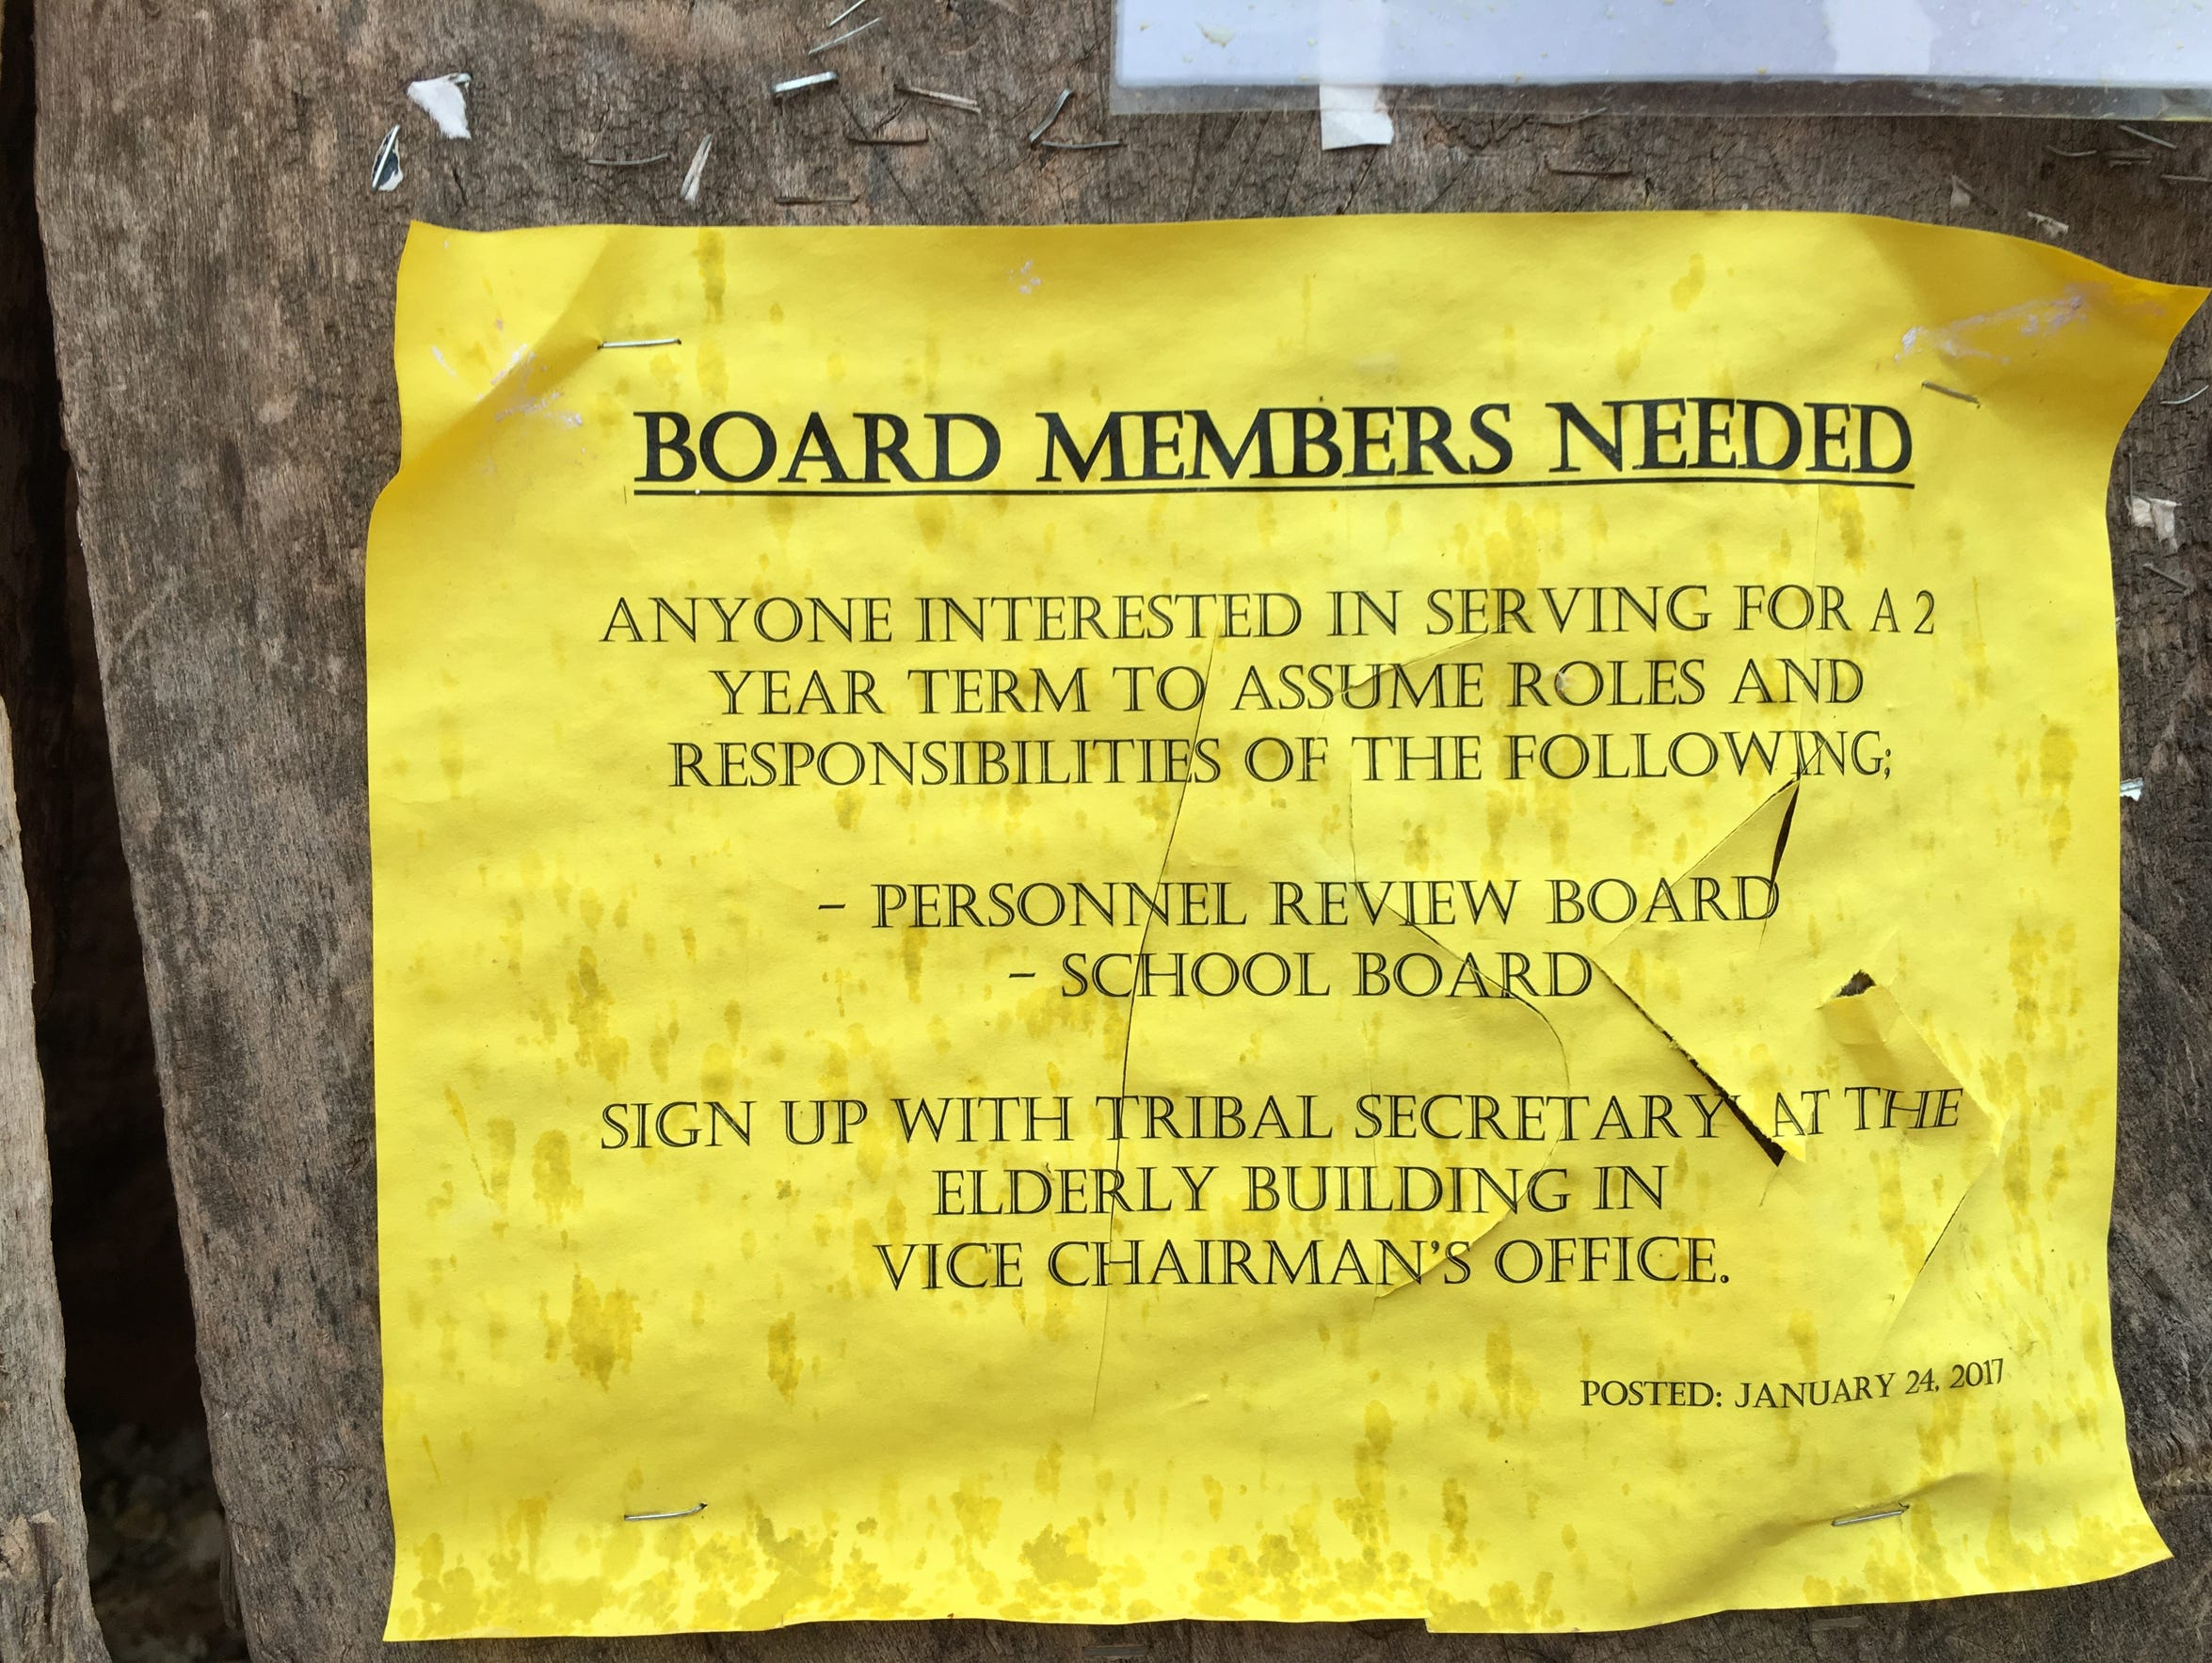 A flier outside Havasupai Elementary School announces